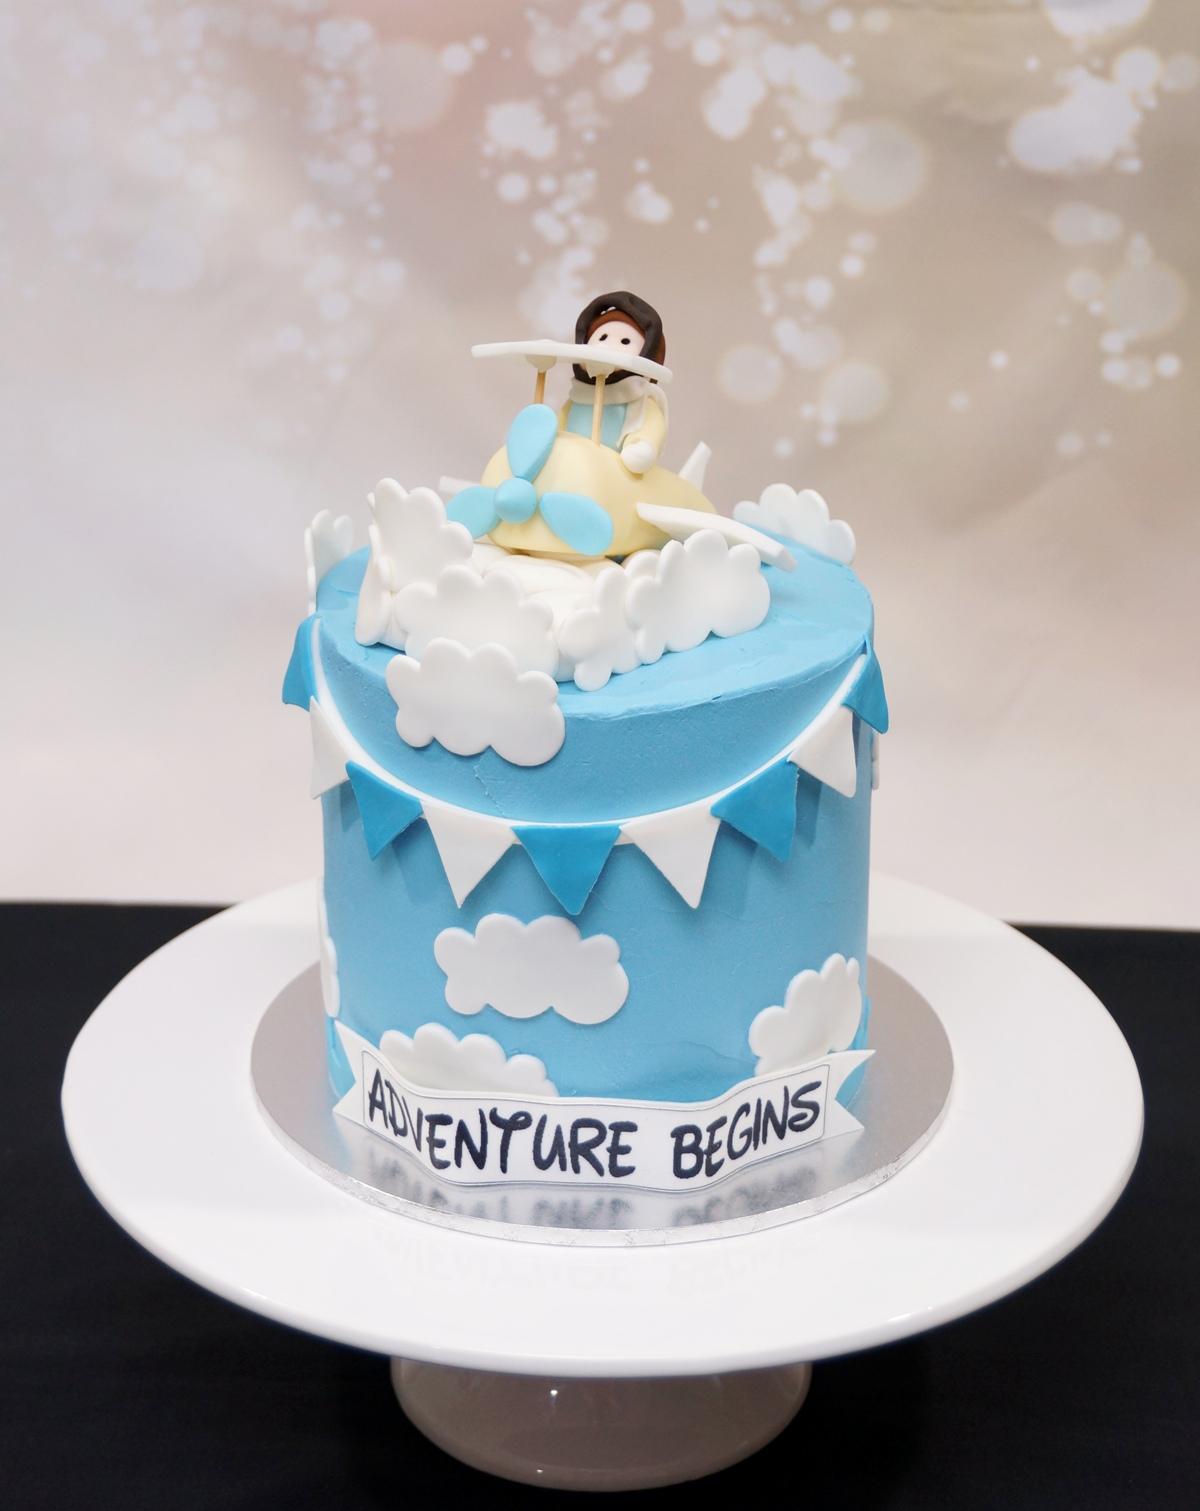 Adventure Begins Baby shower cake